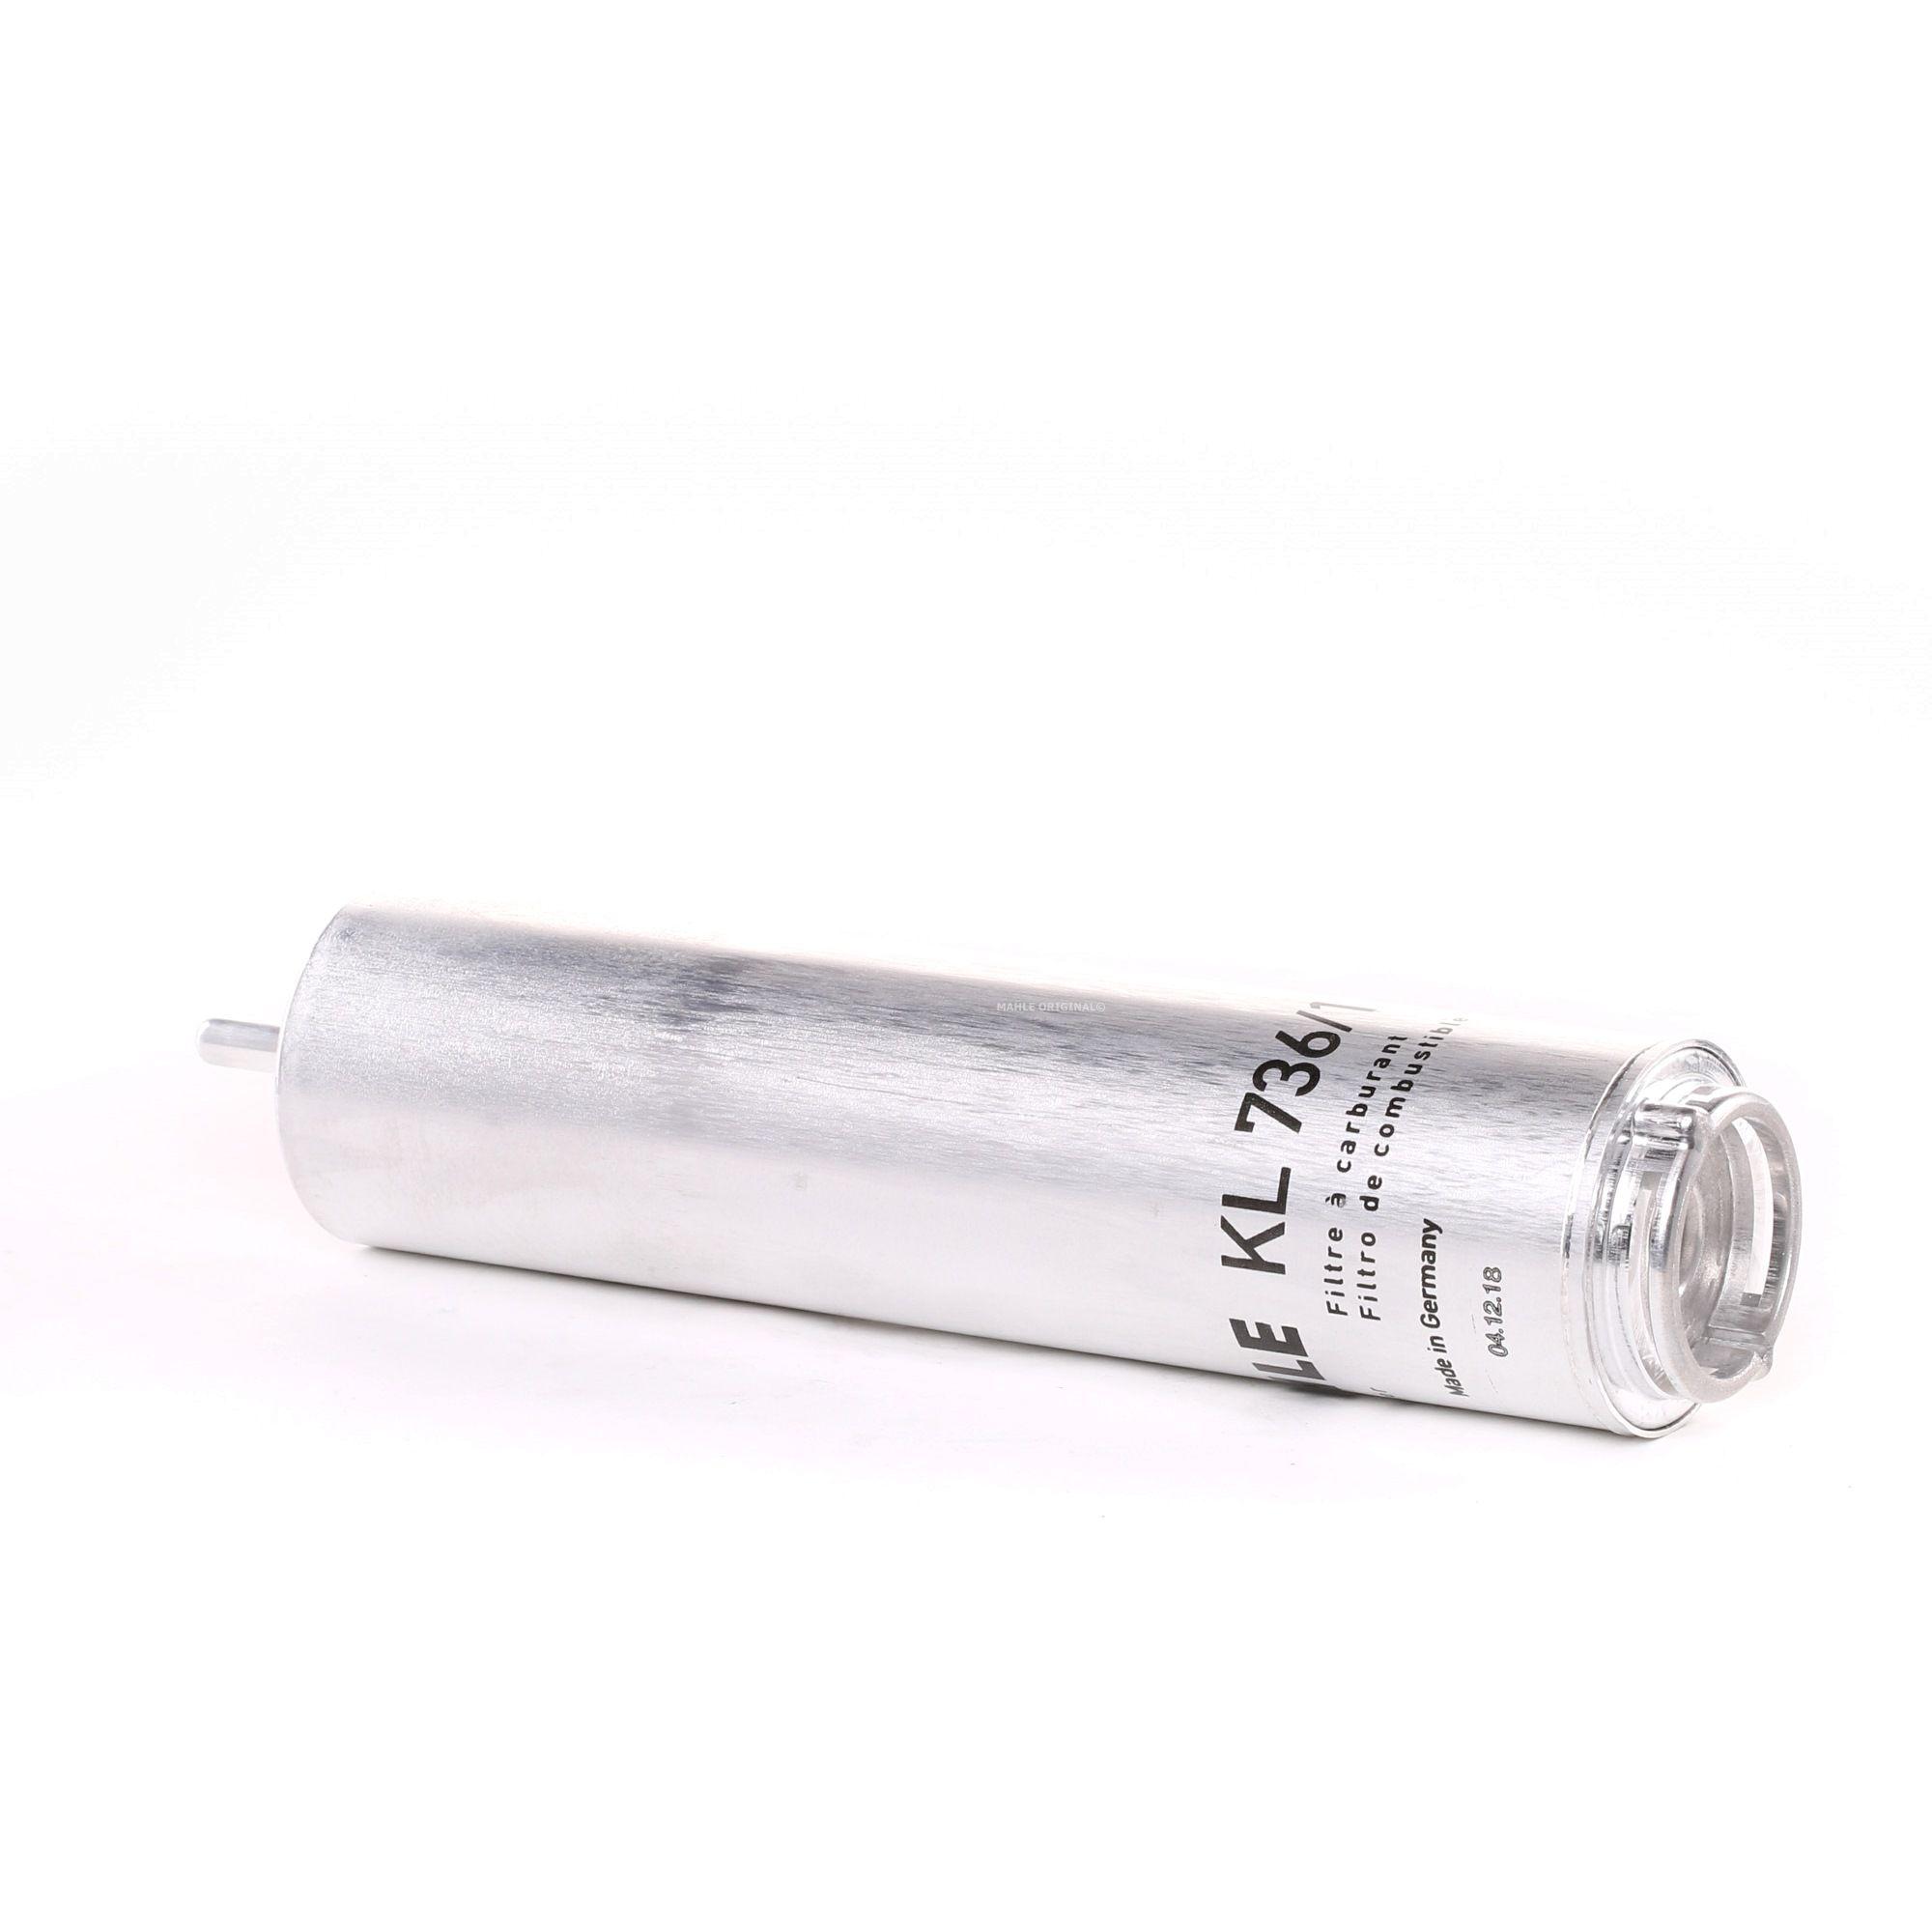 Fuel filter MAHLE ORIGINAL 70584856 rating